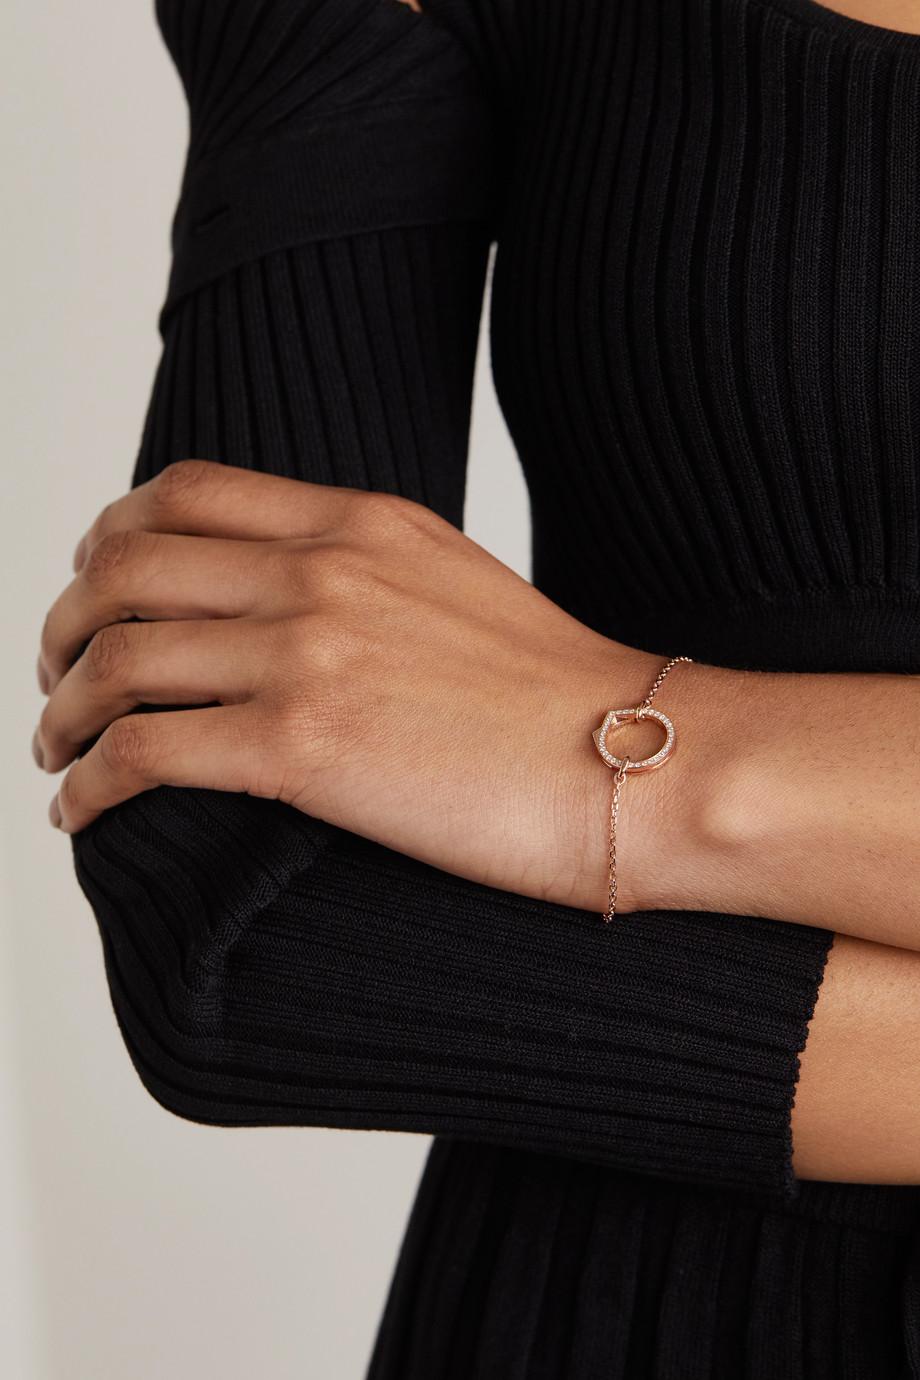 Repossi Bracelet en or rose 18carats (750/1000) et diamants